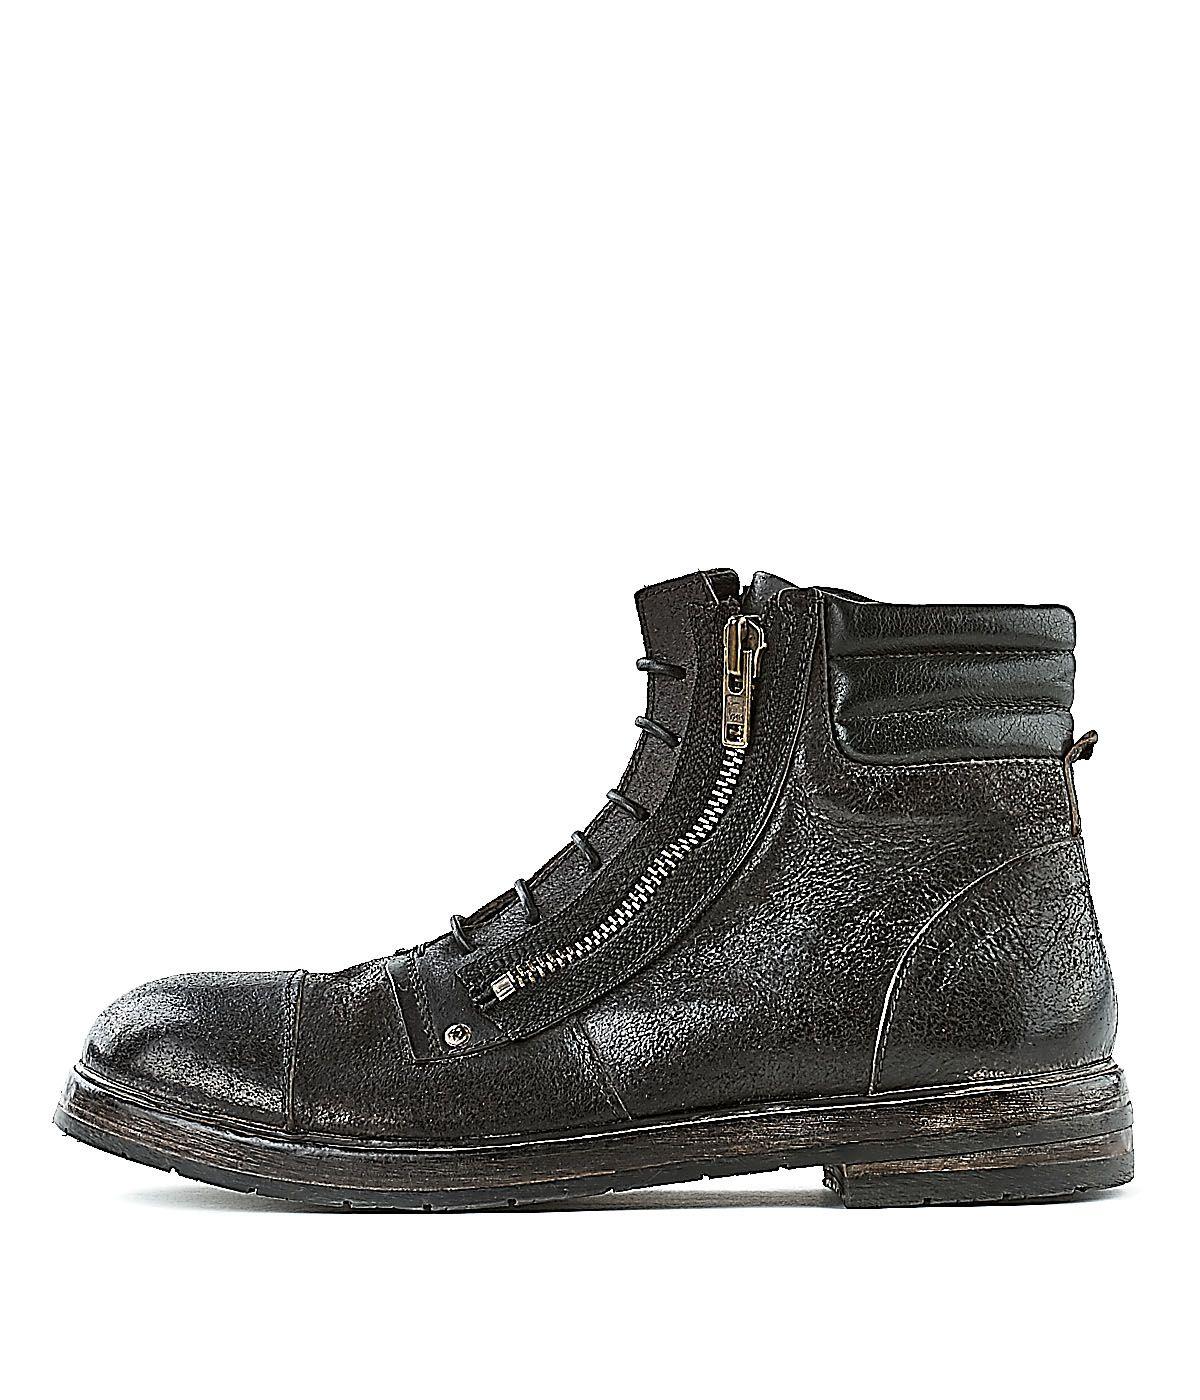 Boots amp;cochristmaspresent Schwarz Moma Rossi Men 55407 Ygfyb67